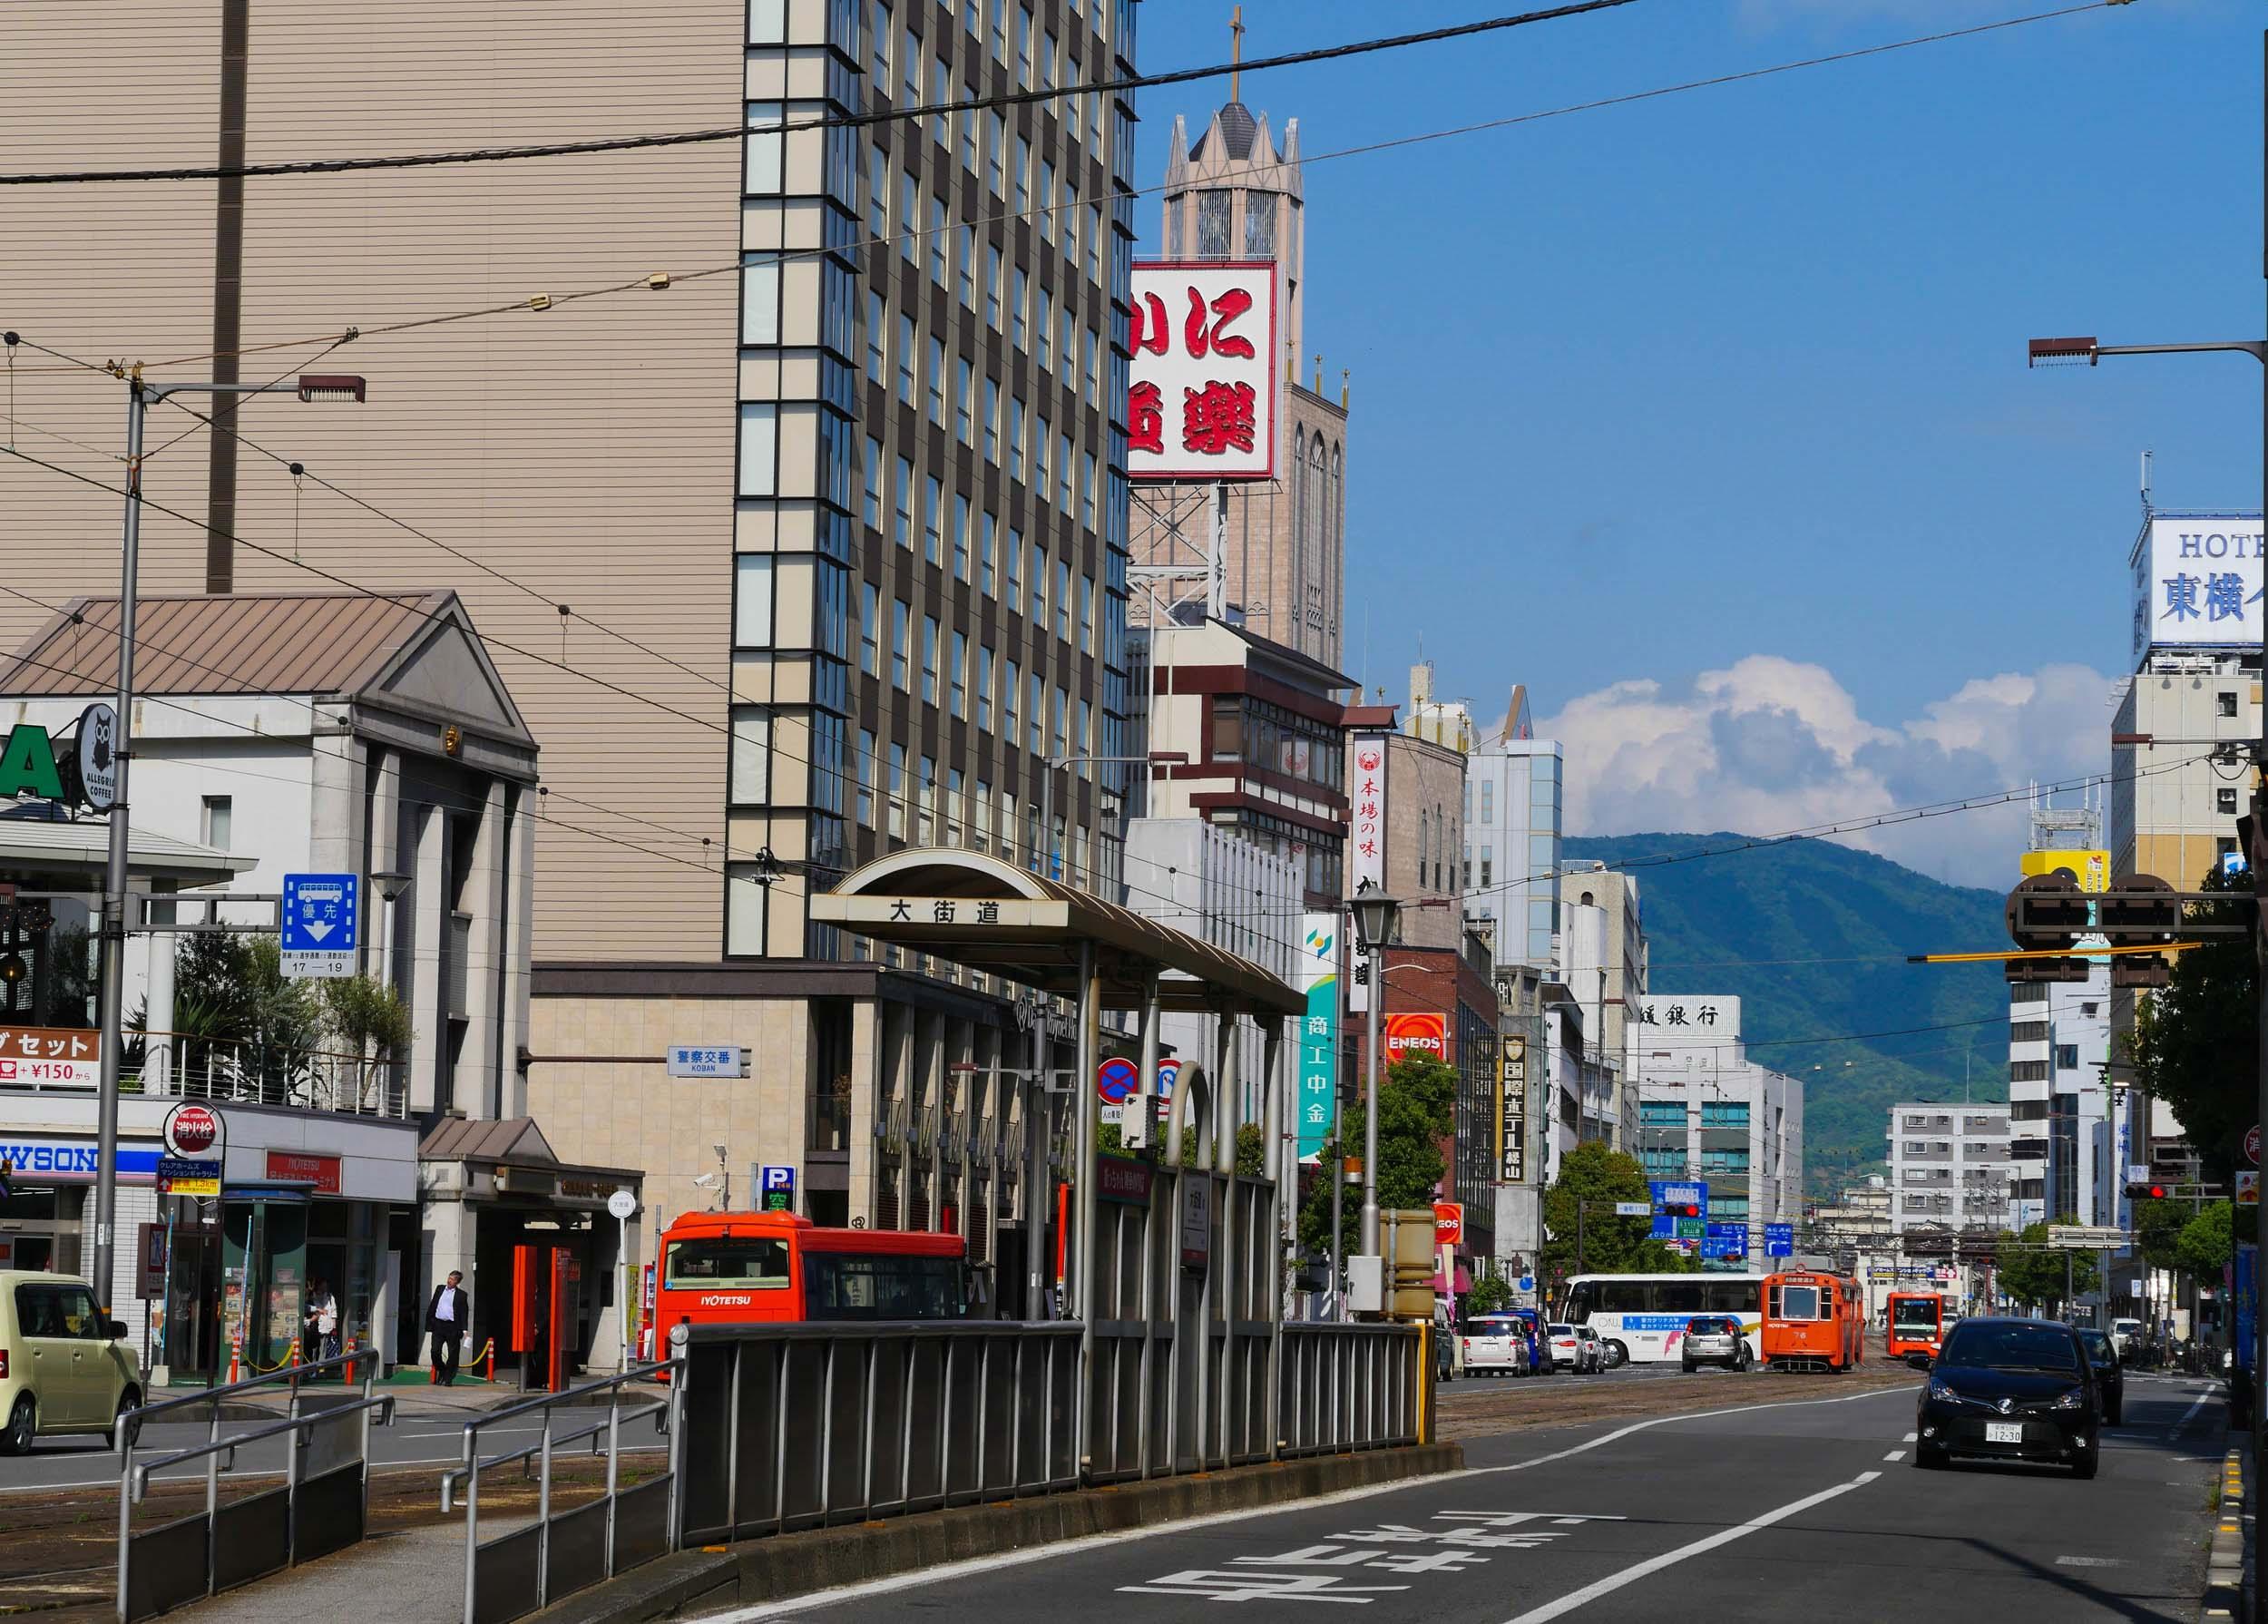 matsuyama-dougo-onsen-5.jpg